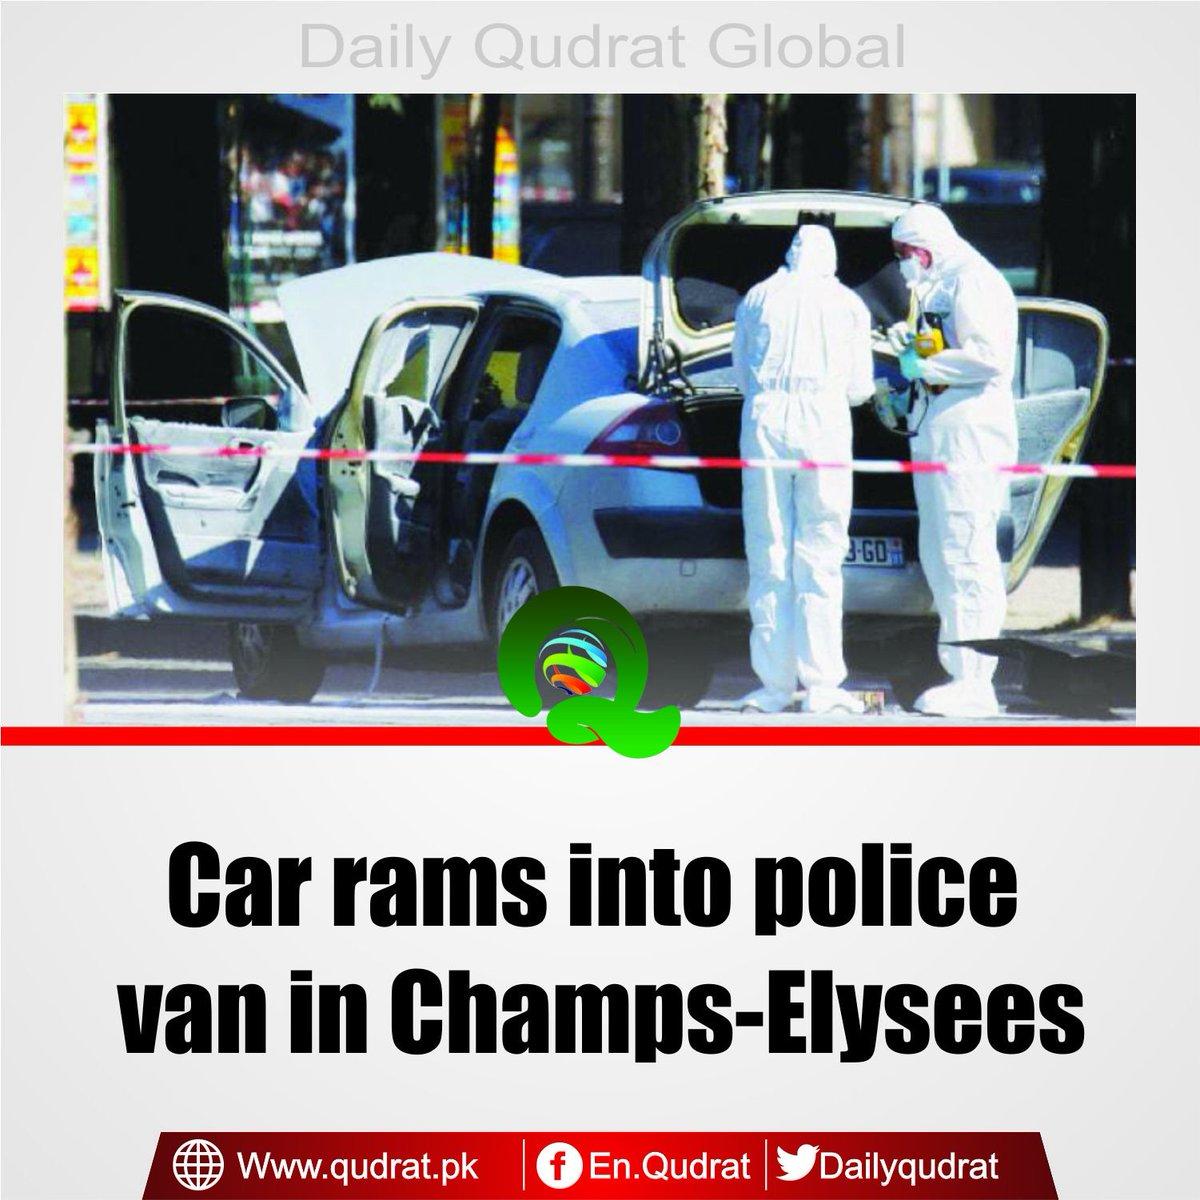 Read More: http:// qudrat.pk/world/20-06-20 17/car-rams-into-police-van-in-champs-elysees/ &nbsp; …   #Car #rams into #police #van in #Champs-#Elysees <br>http://pic.twitter.com/hnrV2zRg4r